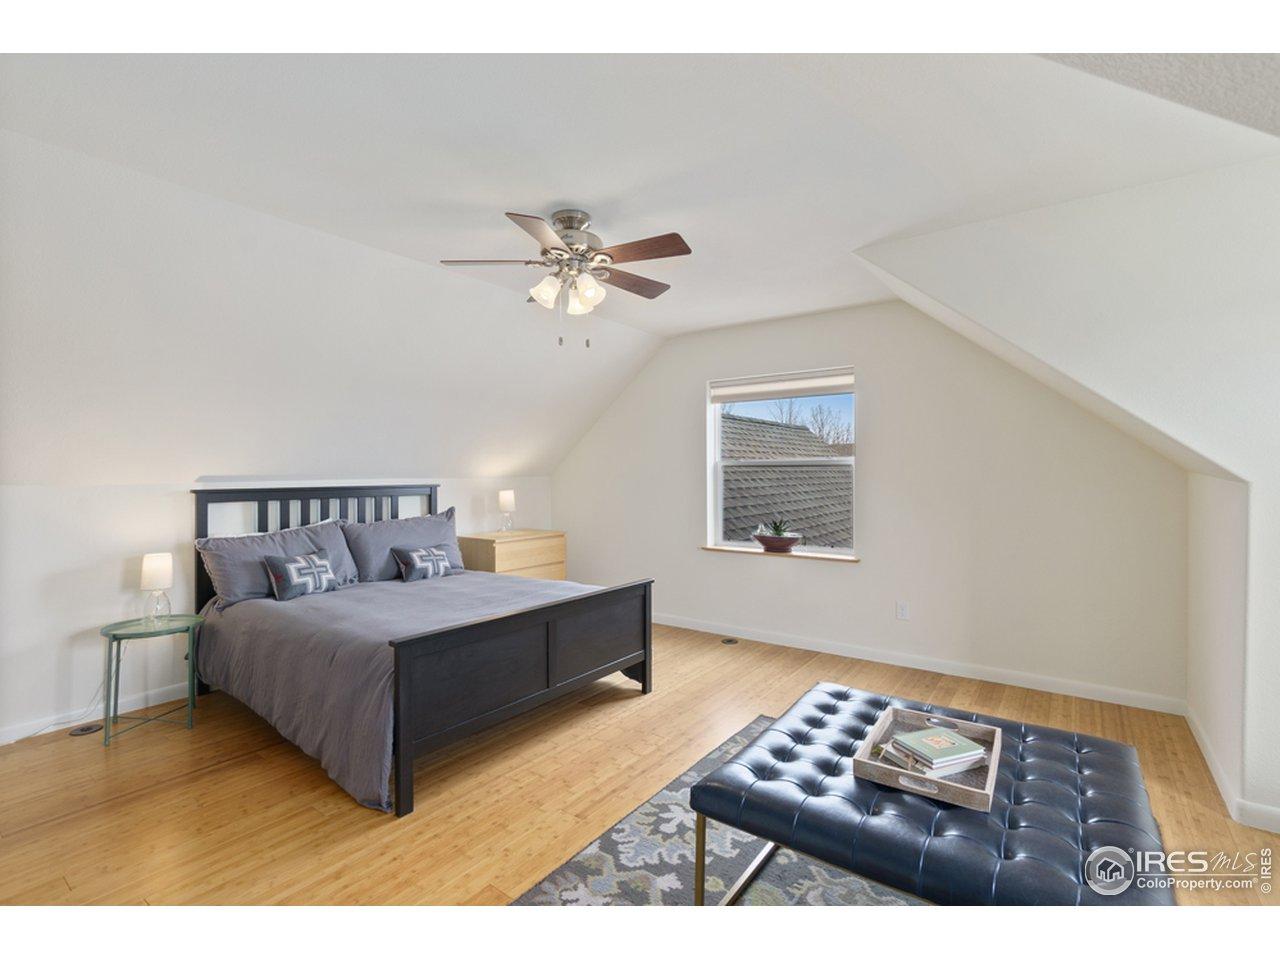 Wonderful room , your choice